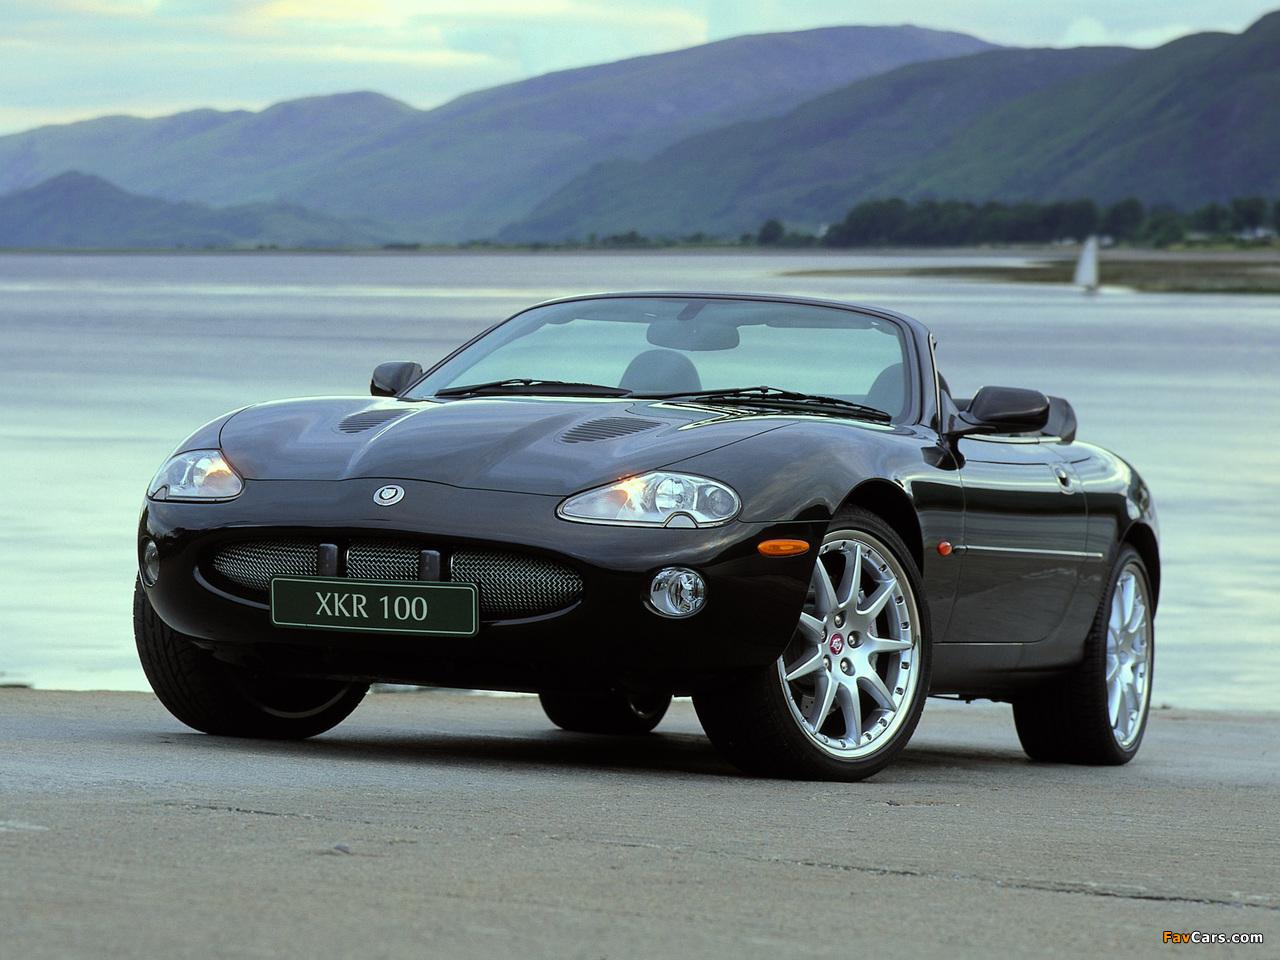 Jaguar XKR 100 Convertible 2002 wallpapers (1280x960)